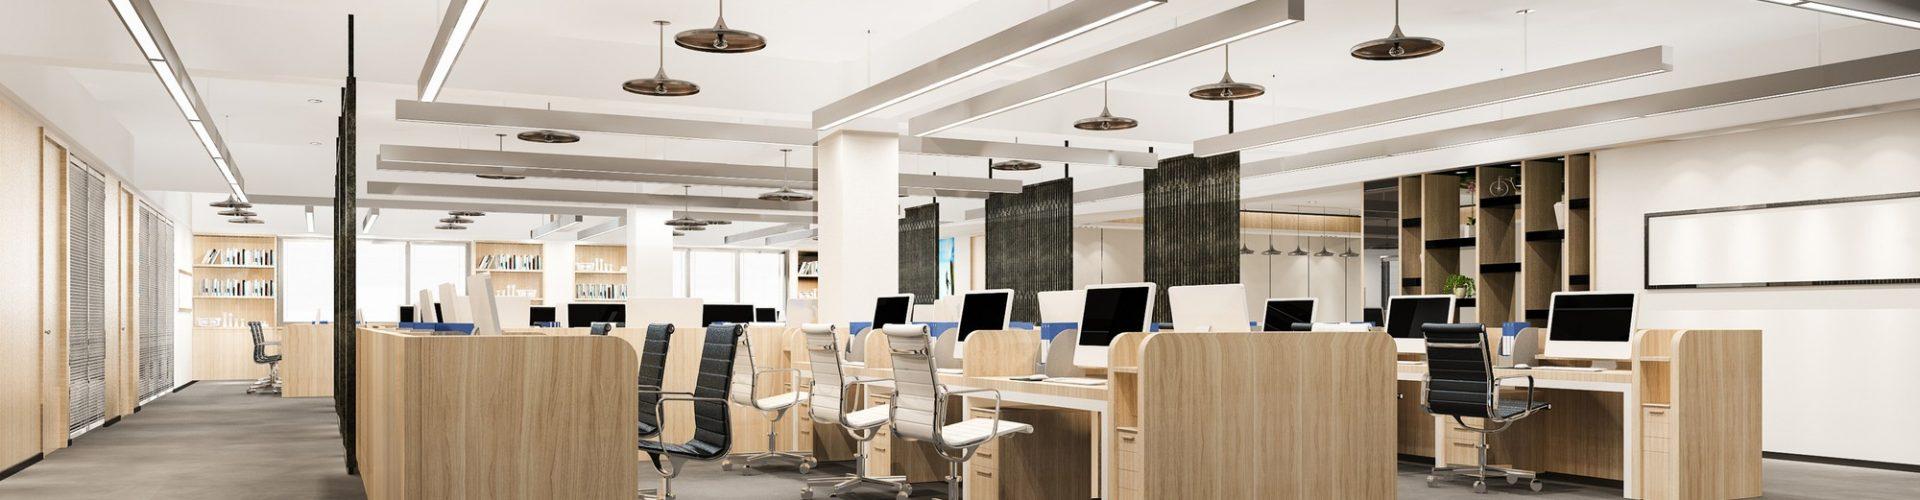 3d-rendering-business-meeting-working-room-office-building (1)